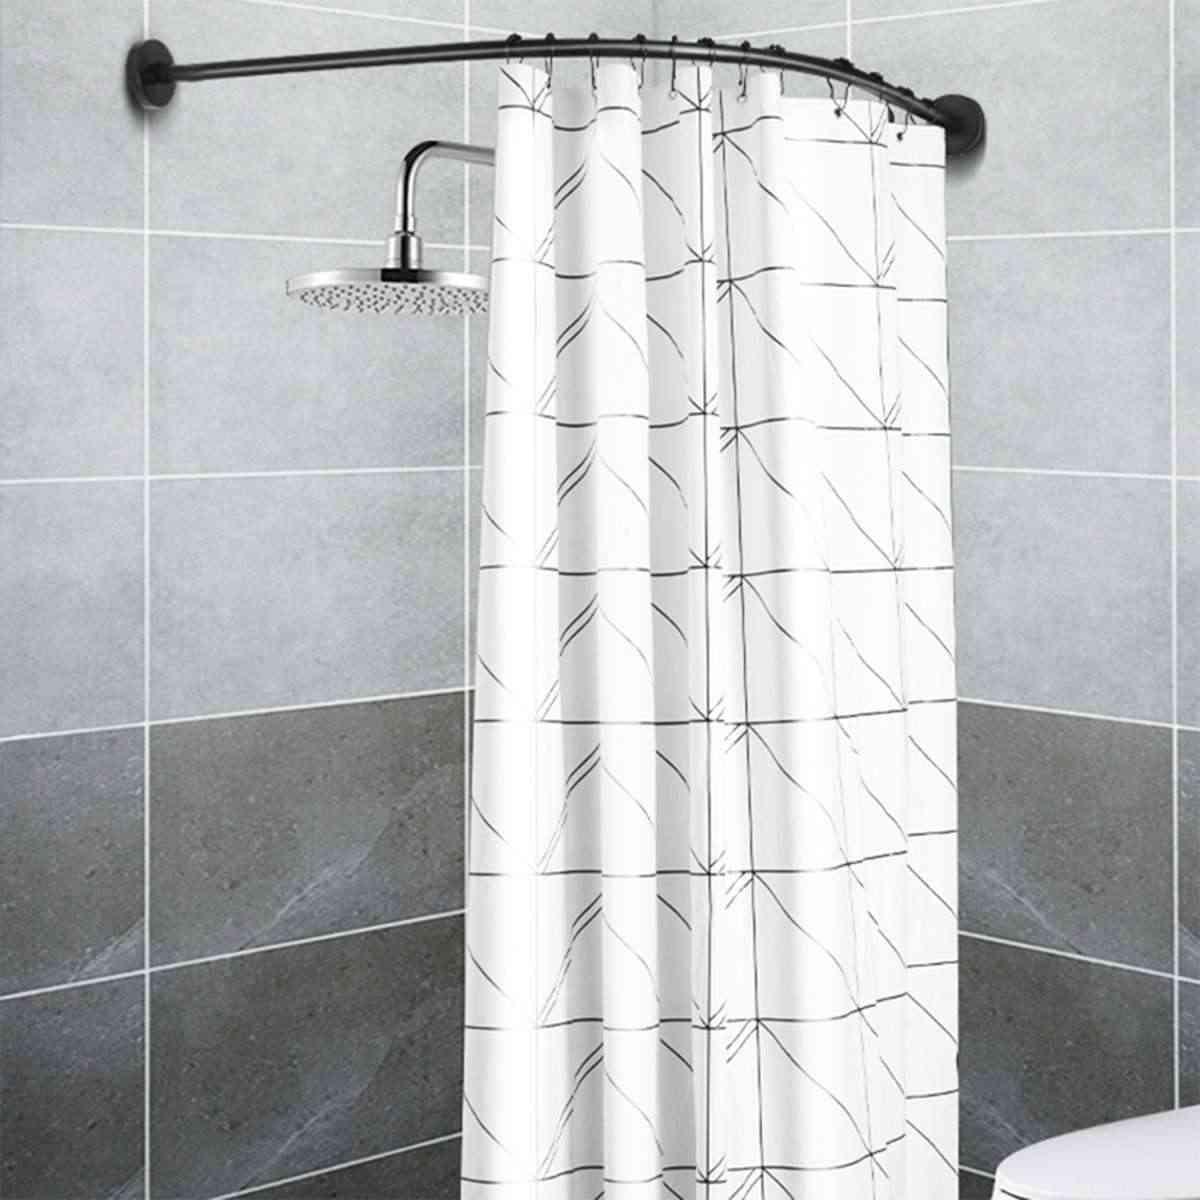 Extendable Corner Shower Curtain Rod Pole Black Stainless Steel Rail Rod Bar Bath Door Hardware Heavy Loaded With 12 Metal Hooks Shower Curtain Poles Aliexpress